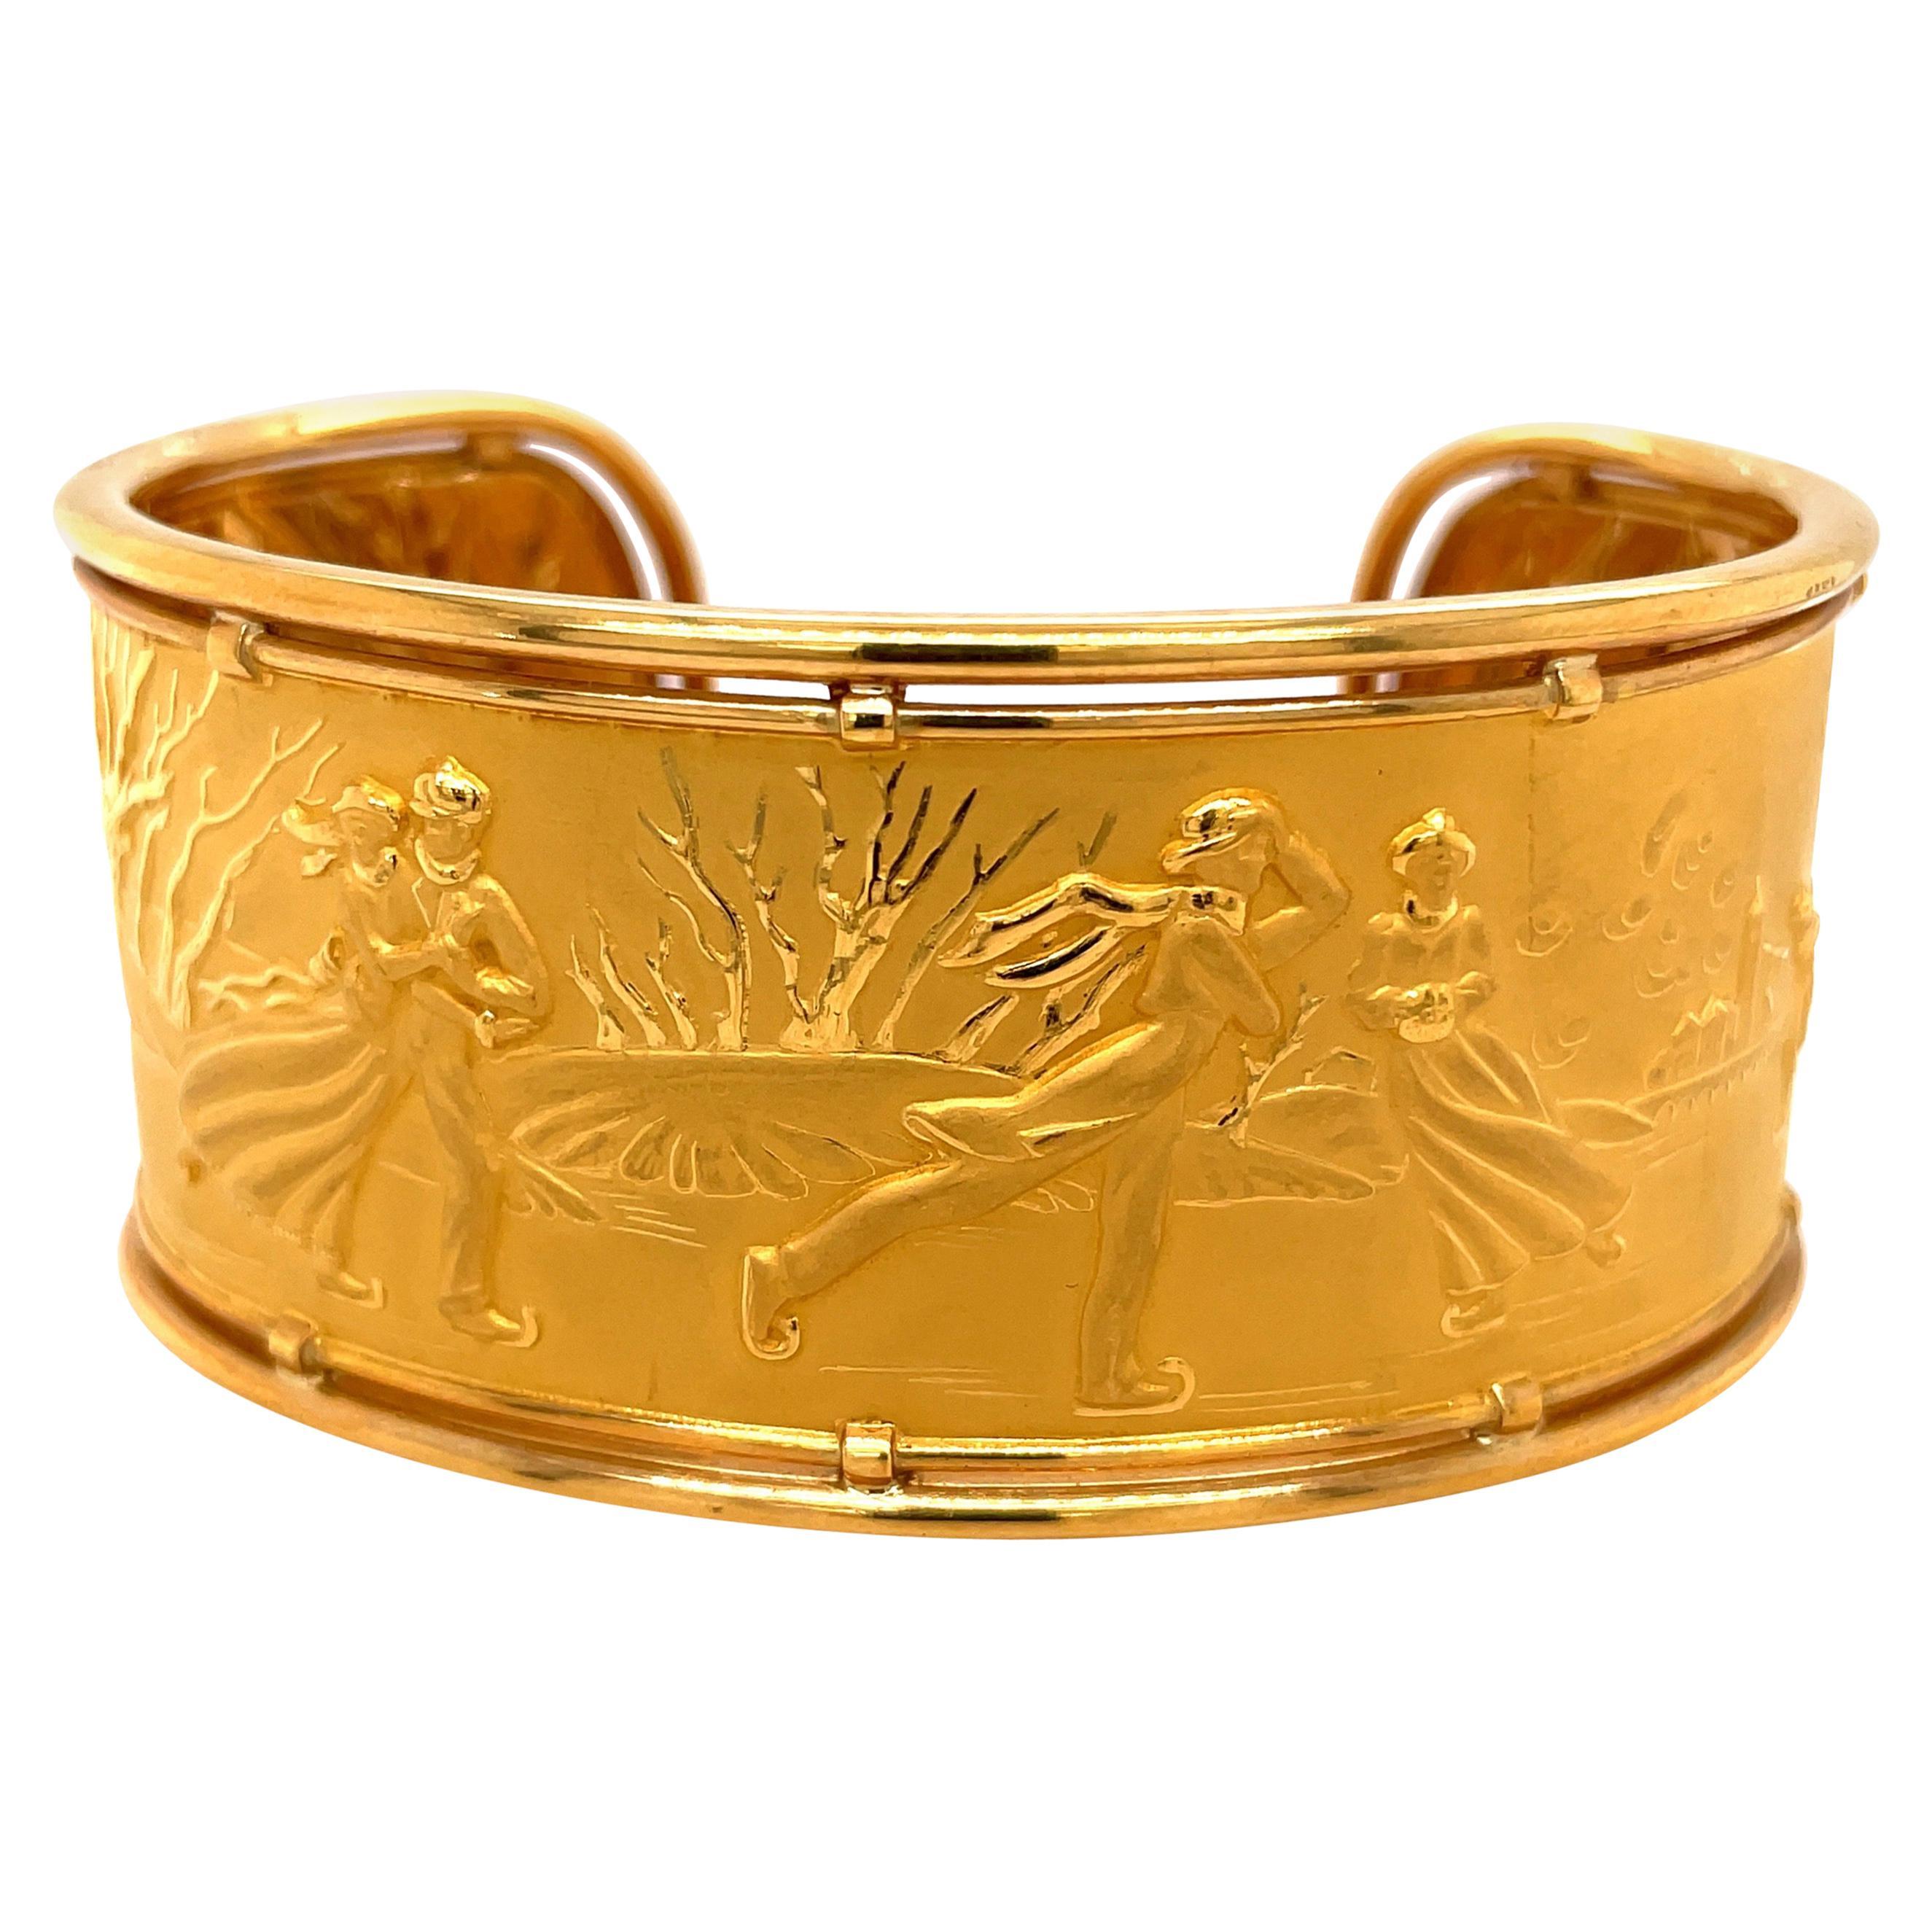 "Carrera y Carrera 18kt Yellow Gold ""Romantica Skaters"" Cuff Bracelet"